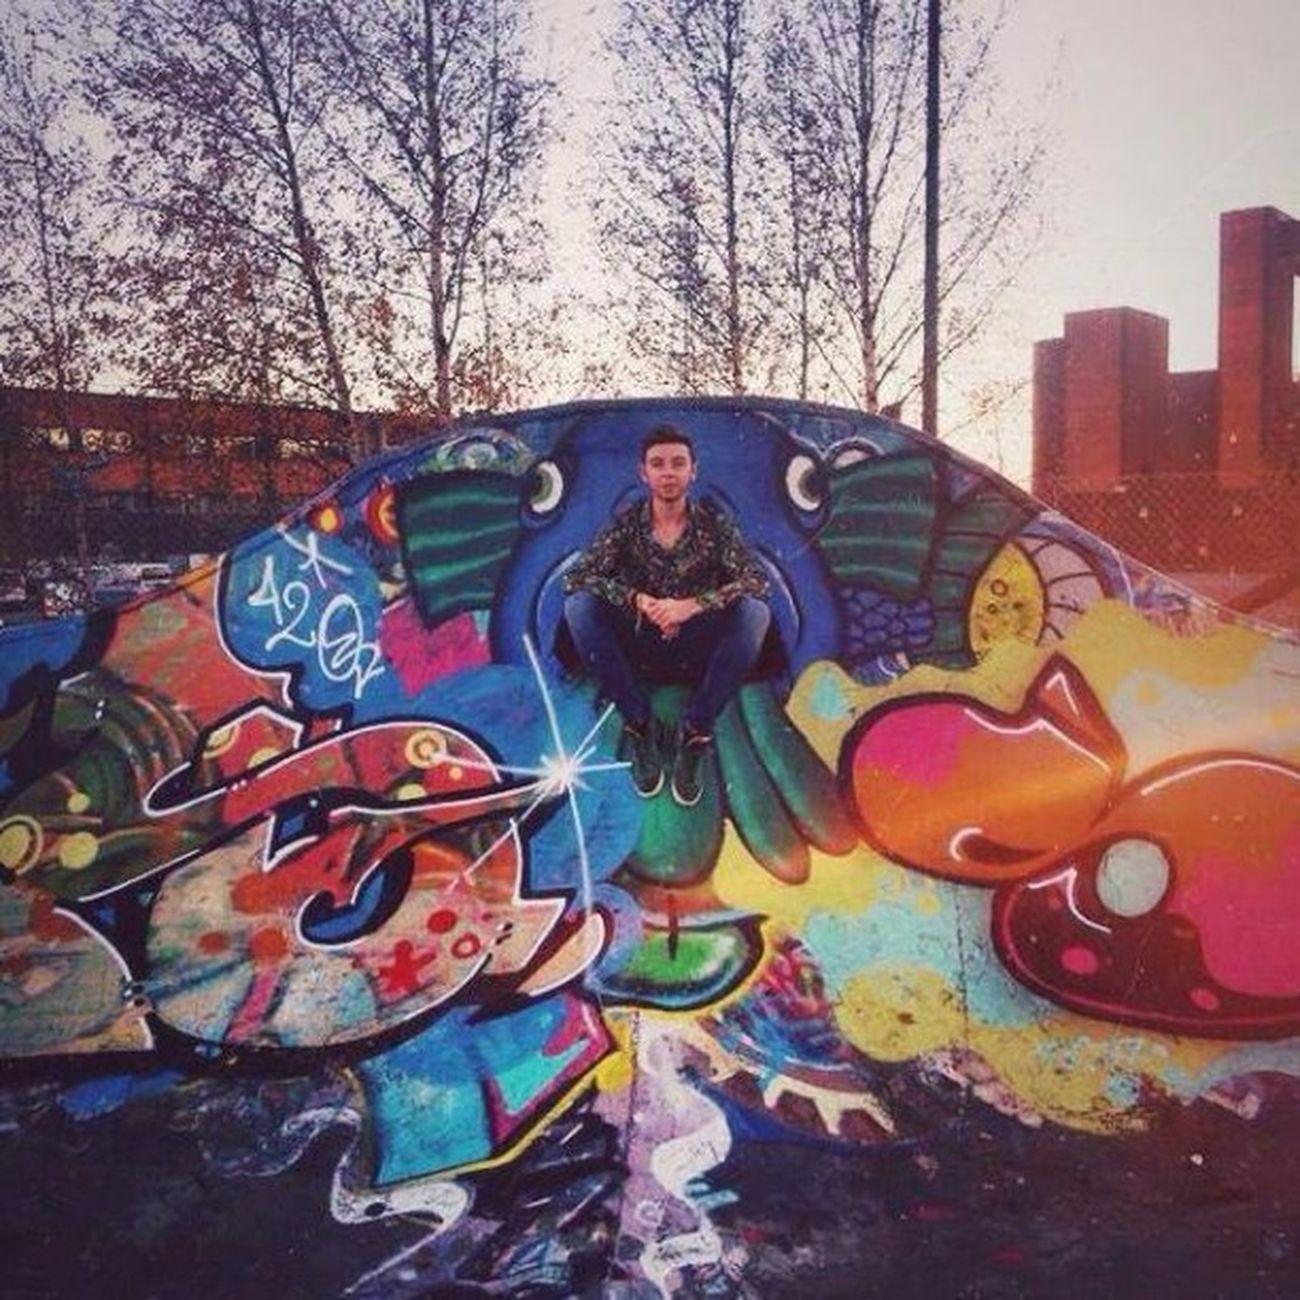 Helsinki Still Eramus Tag Tags Grafitis Skate Park Sunset Bzh FR Finland